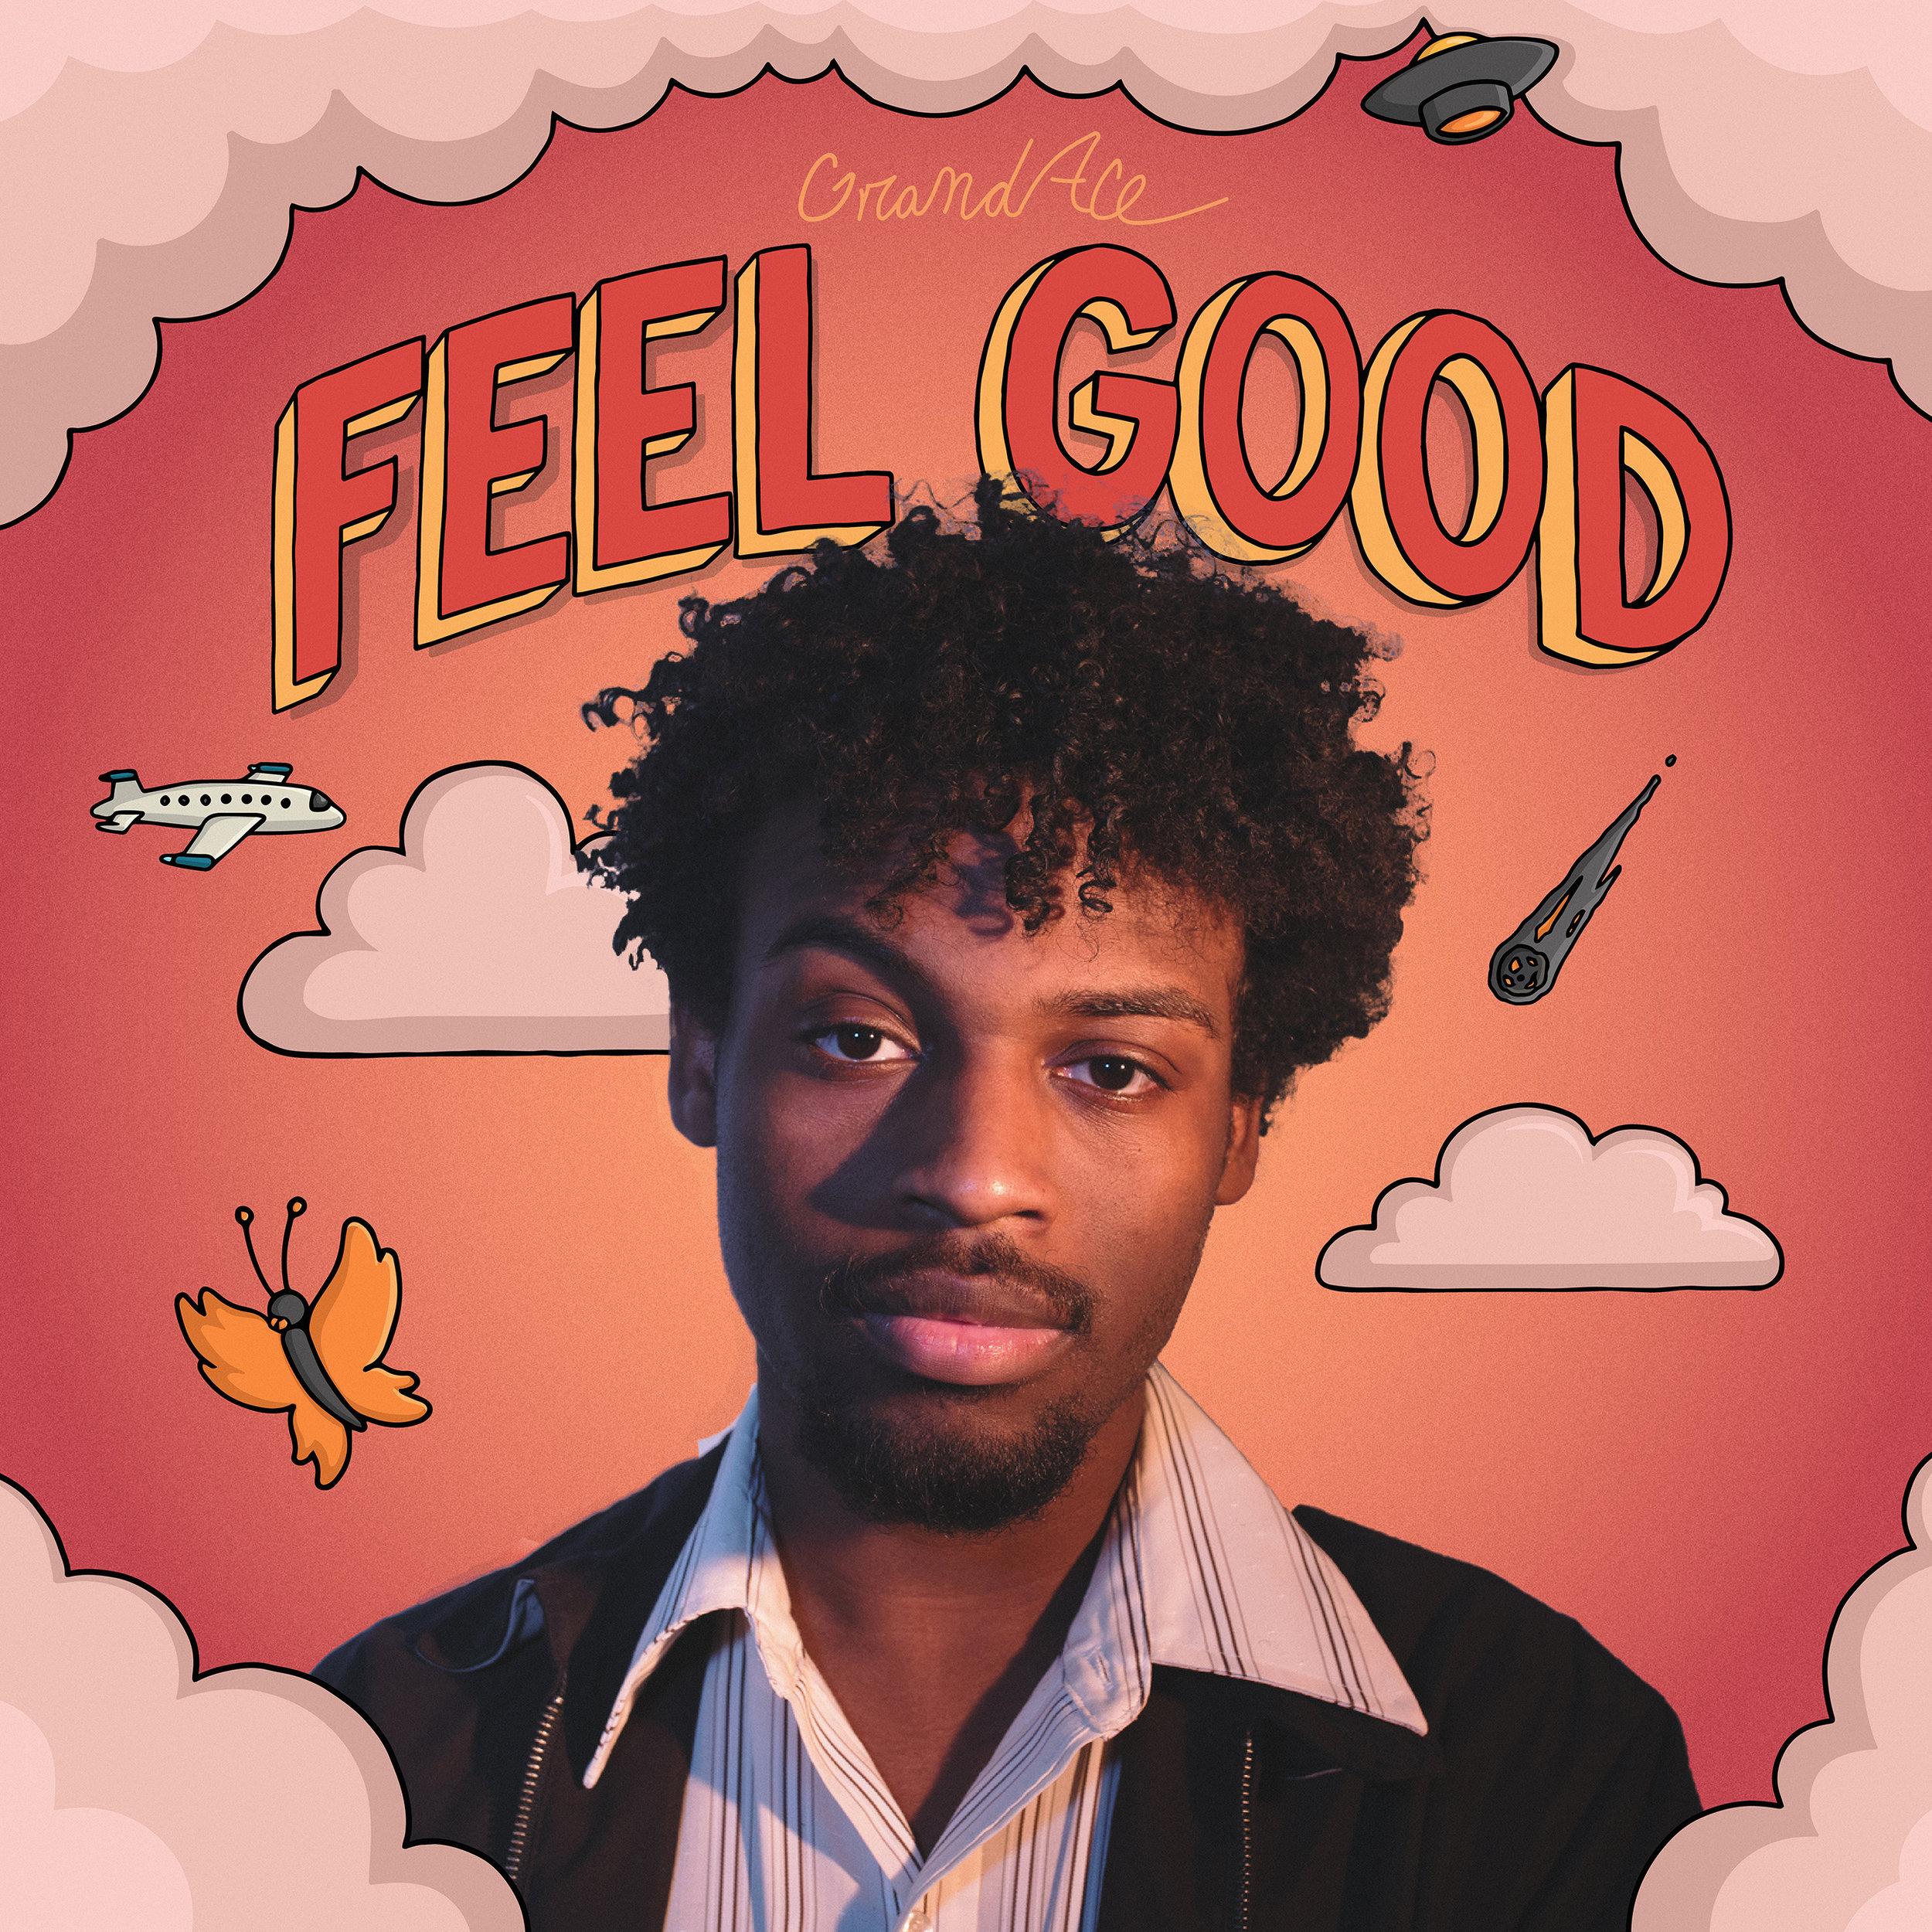 GrandAce Feel Good Cover.jpg